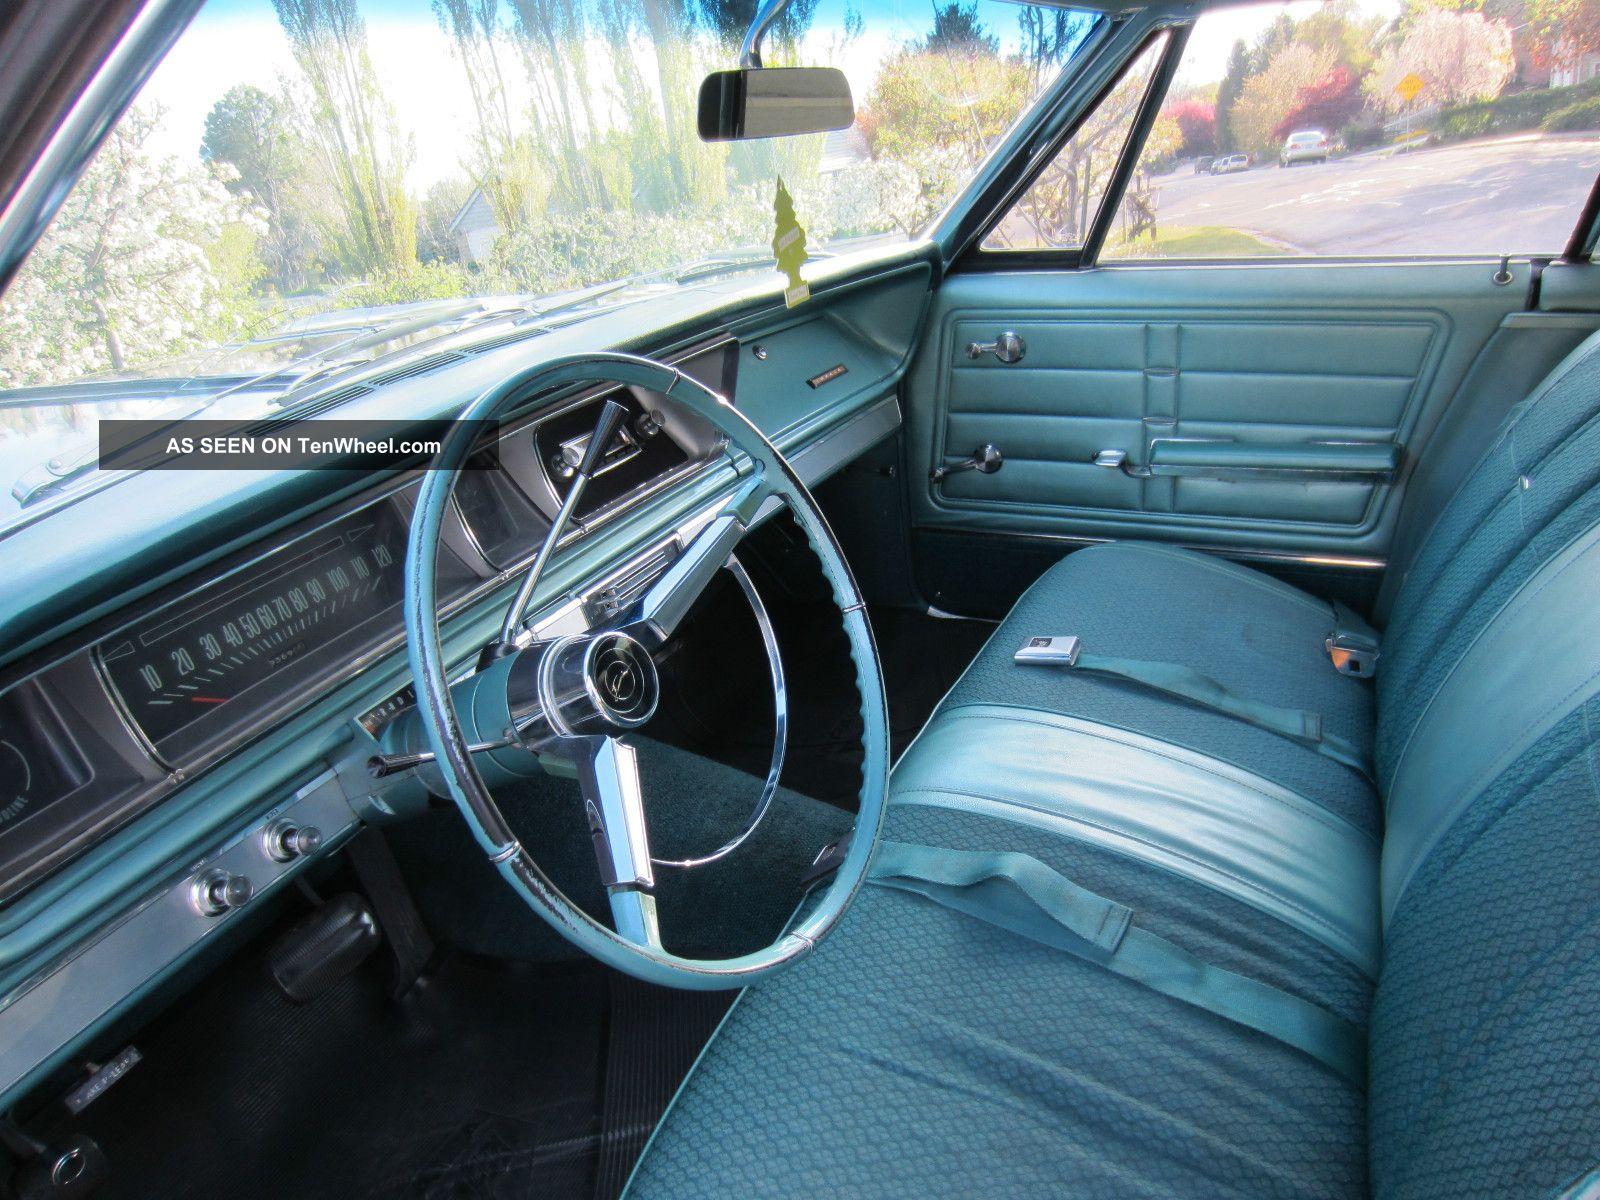 1966 Chevrolet Bel Air Interior Impala Black Gray Base Hardtop Door 1600x1200